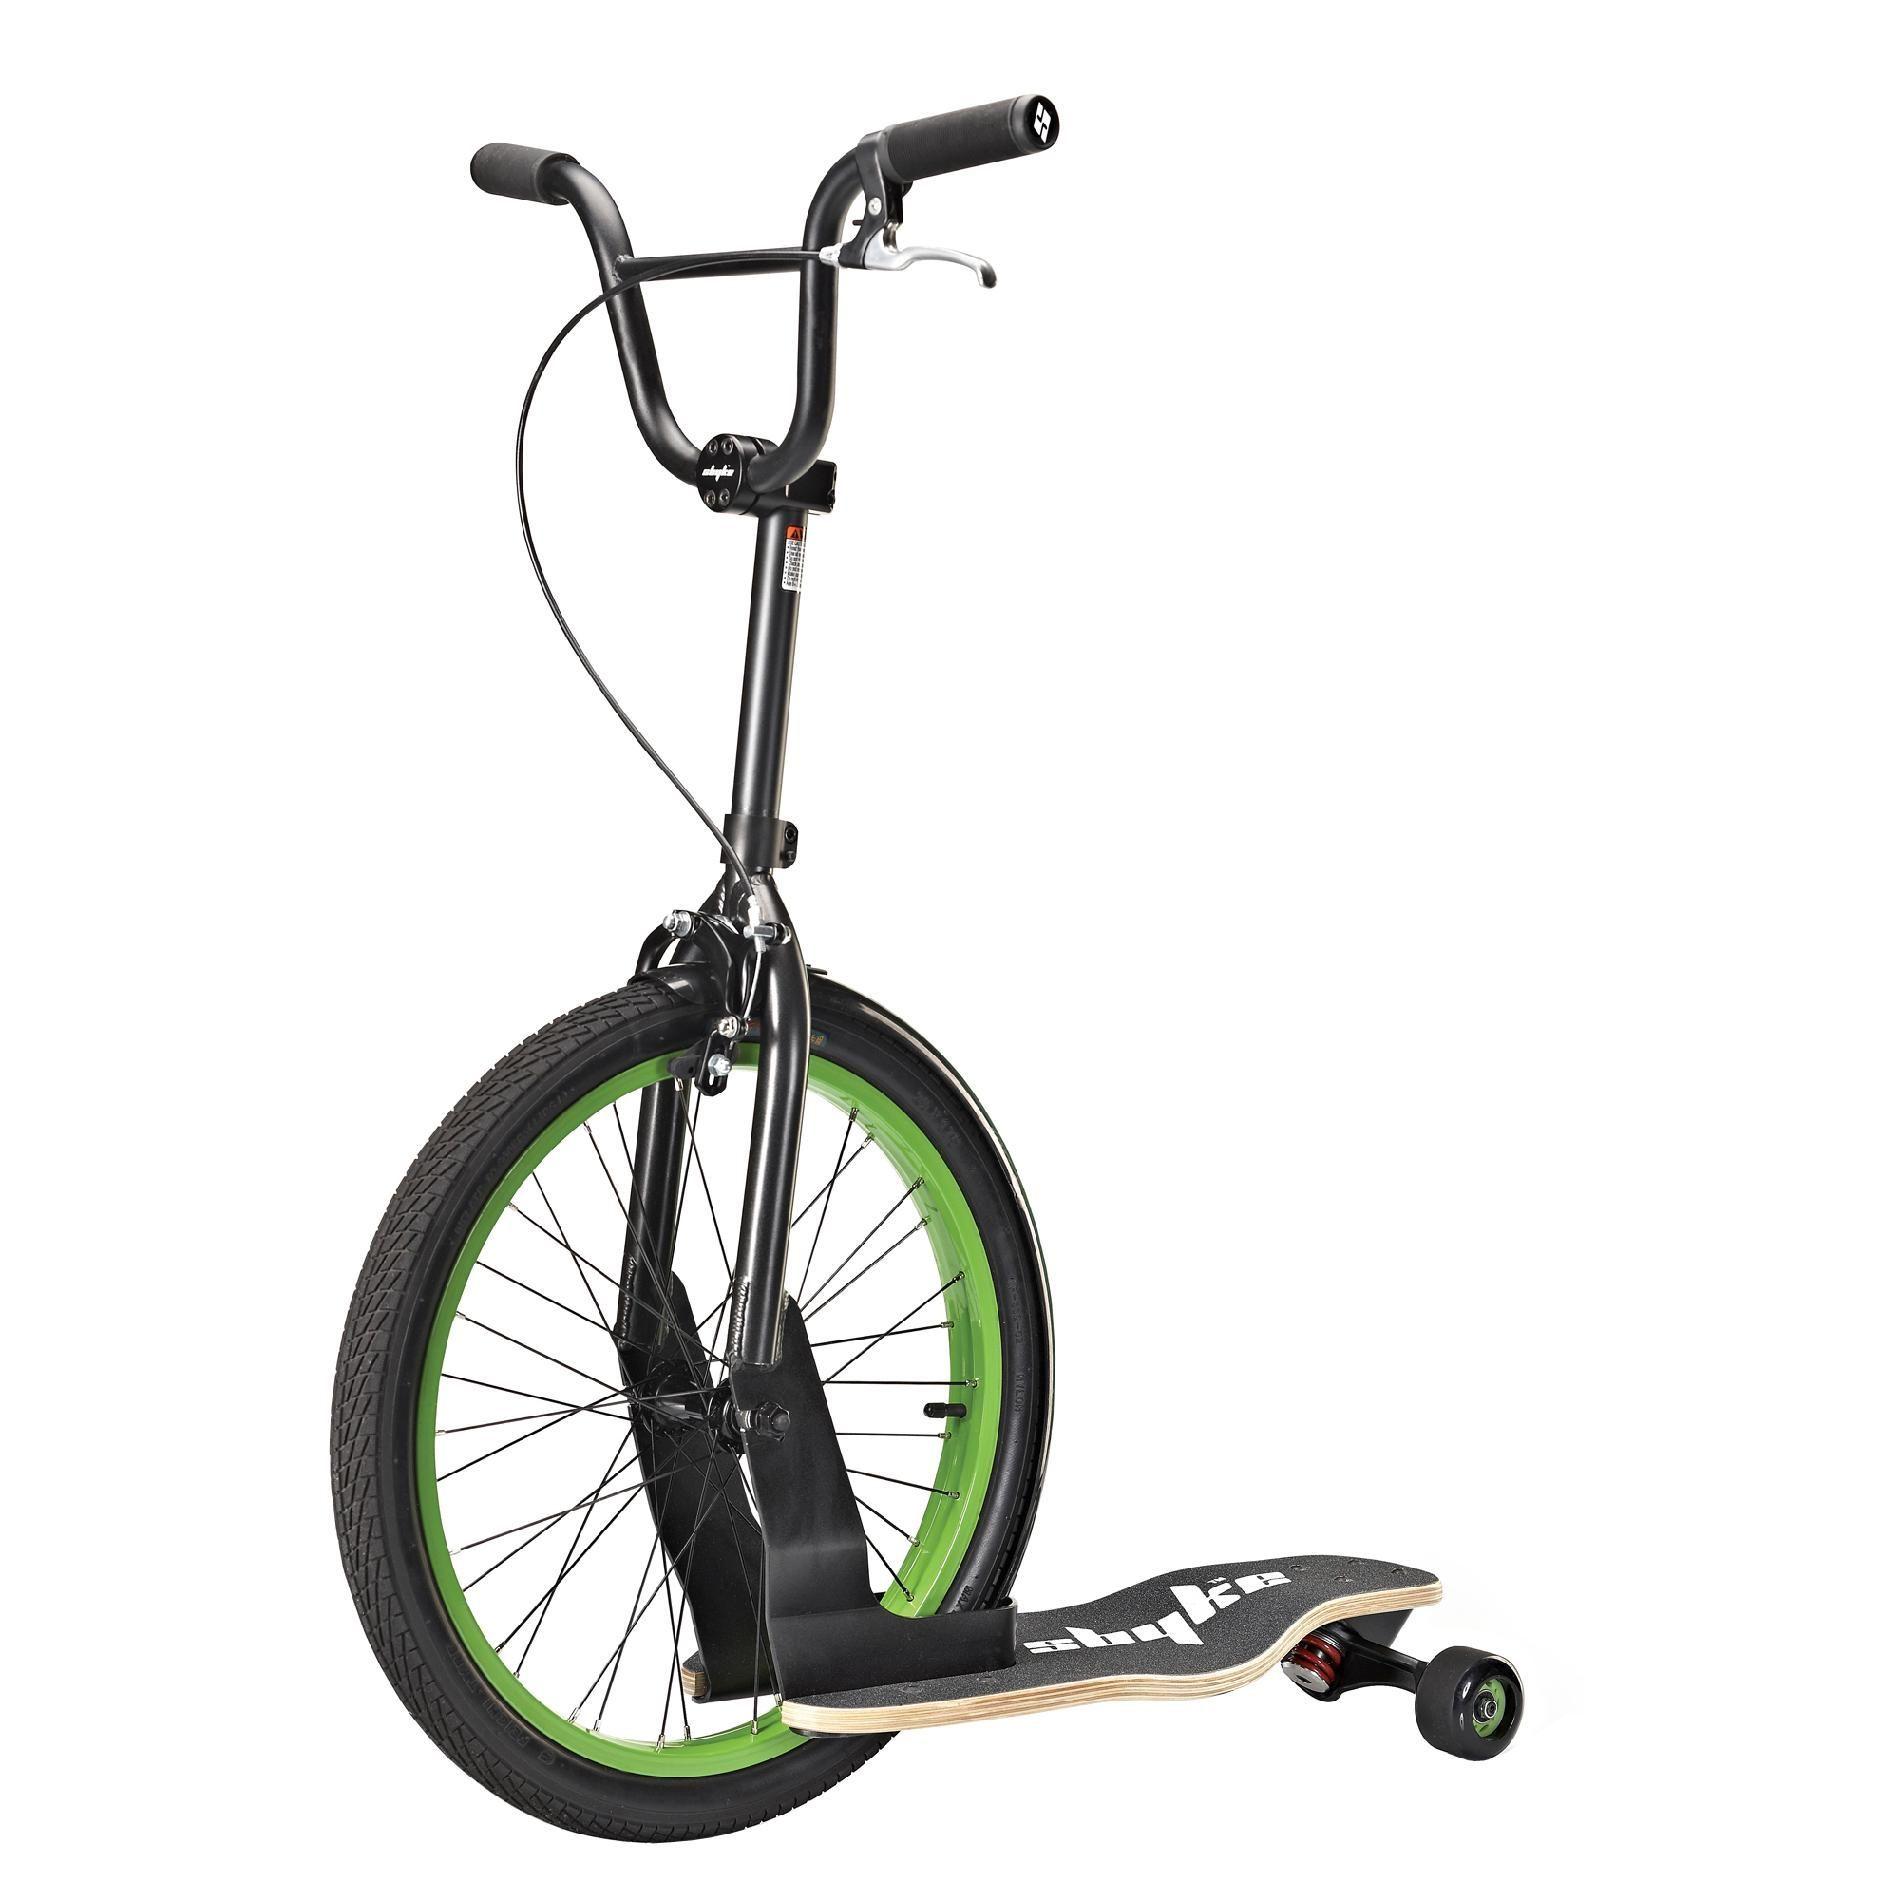 Sbyke P20 Skateboard Bike Hybrid Kick Scooter 851911003006 The